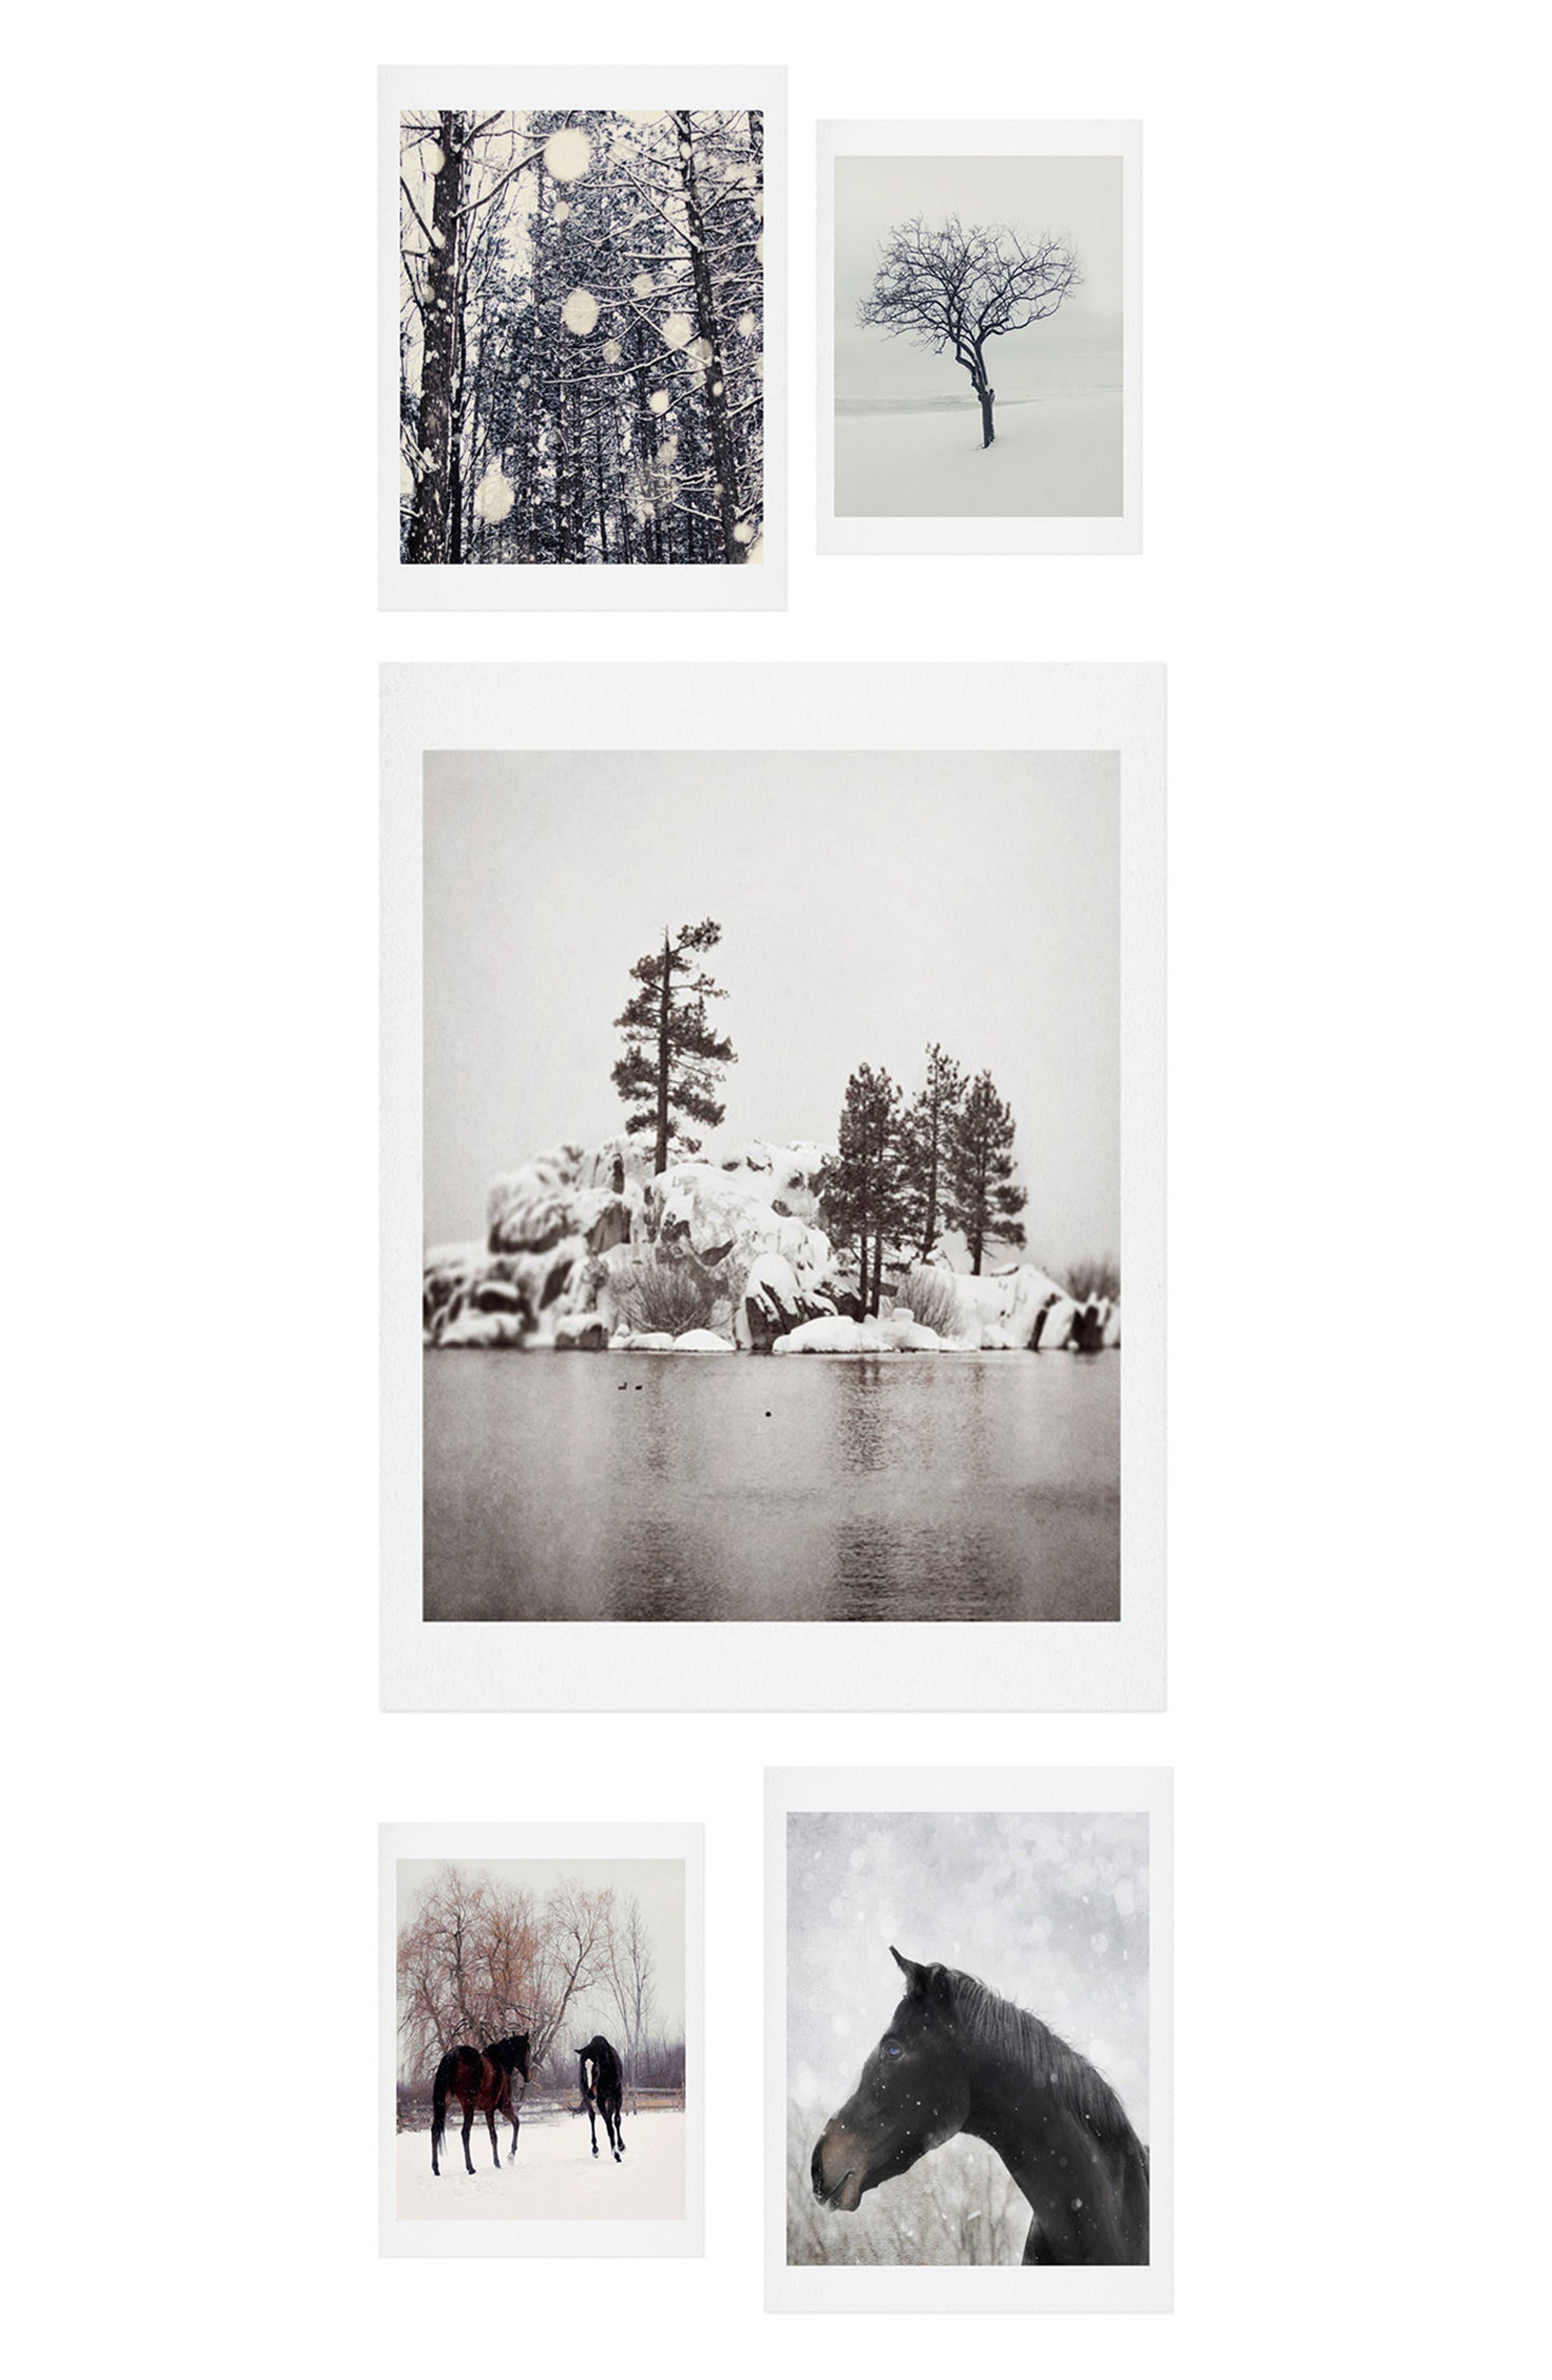 Main Image - Deny Designs Winter Farm 5-Piece Gallery Wall Art Print Set